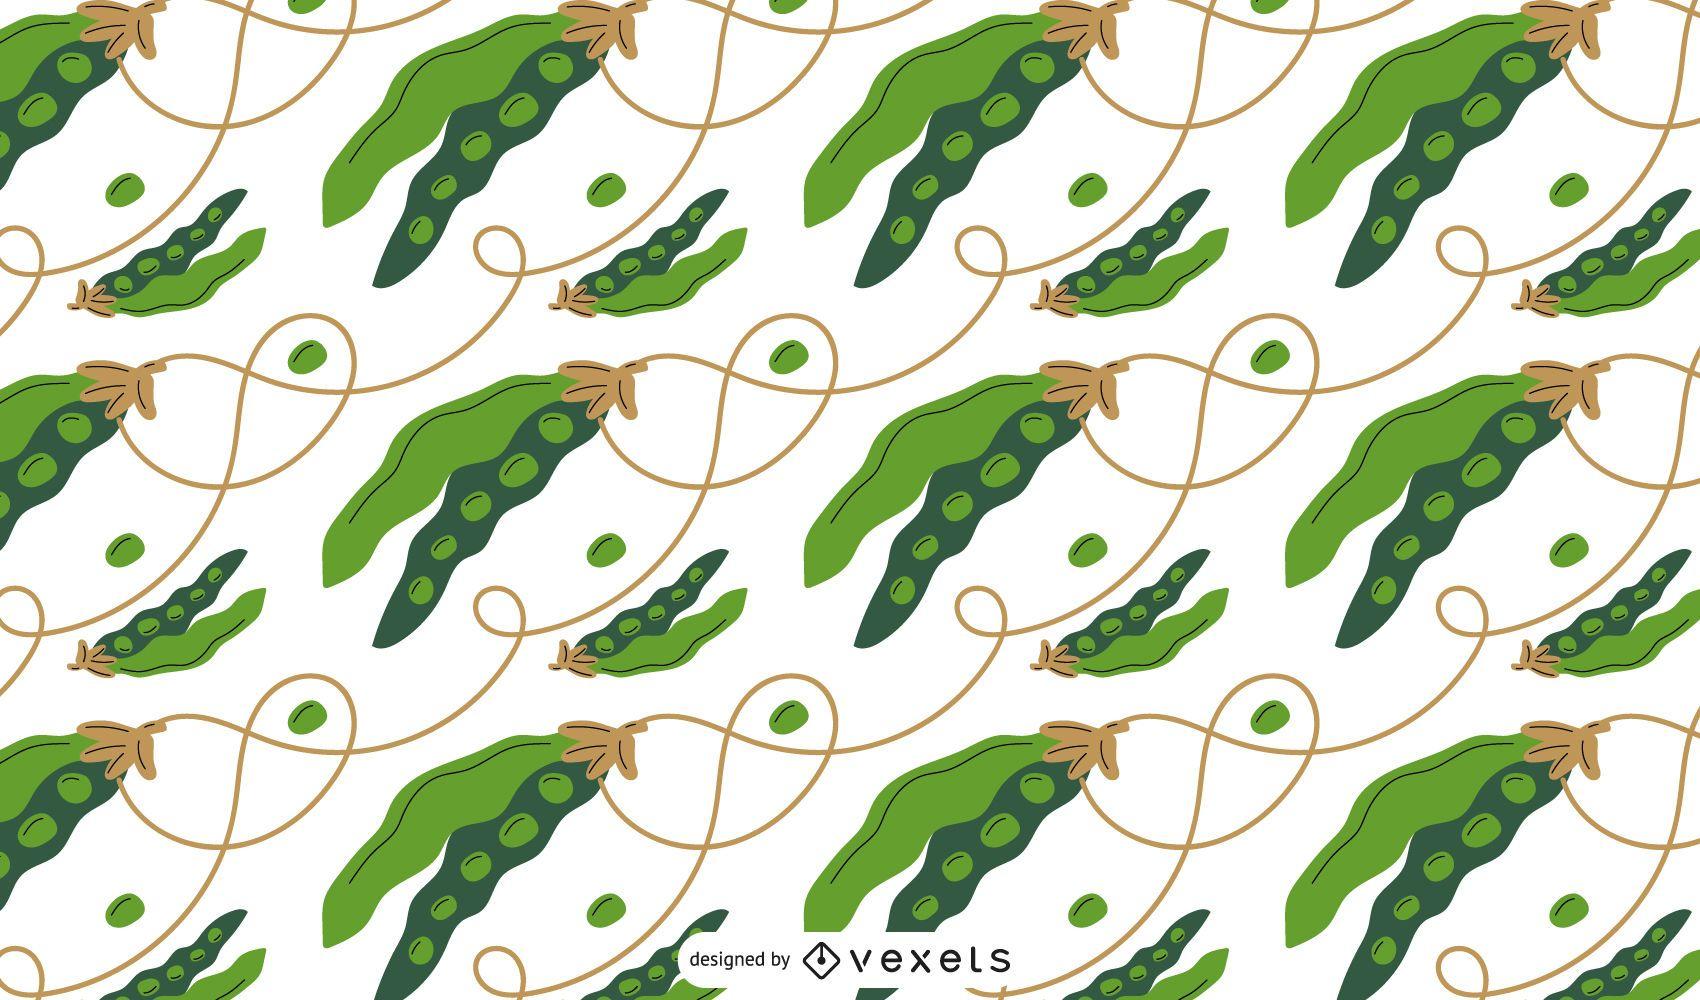 Diseño de patrón de guisantes